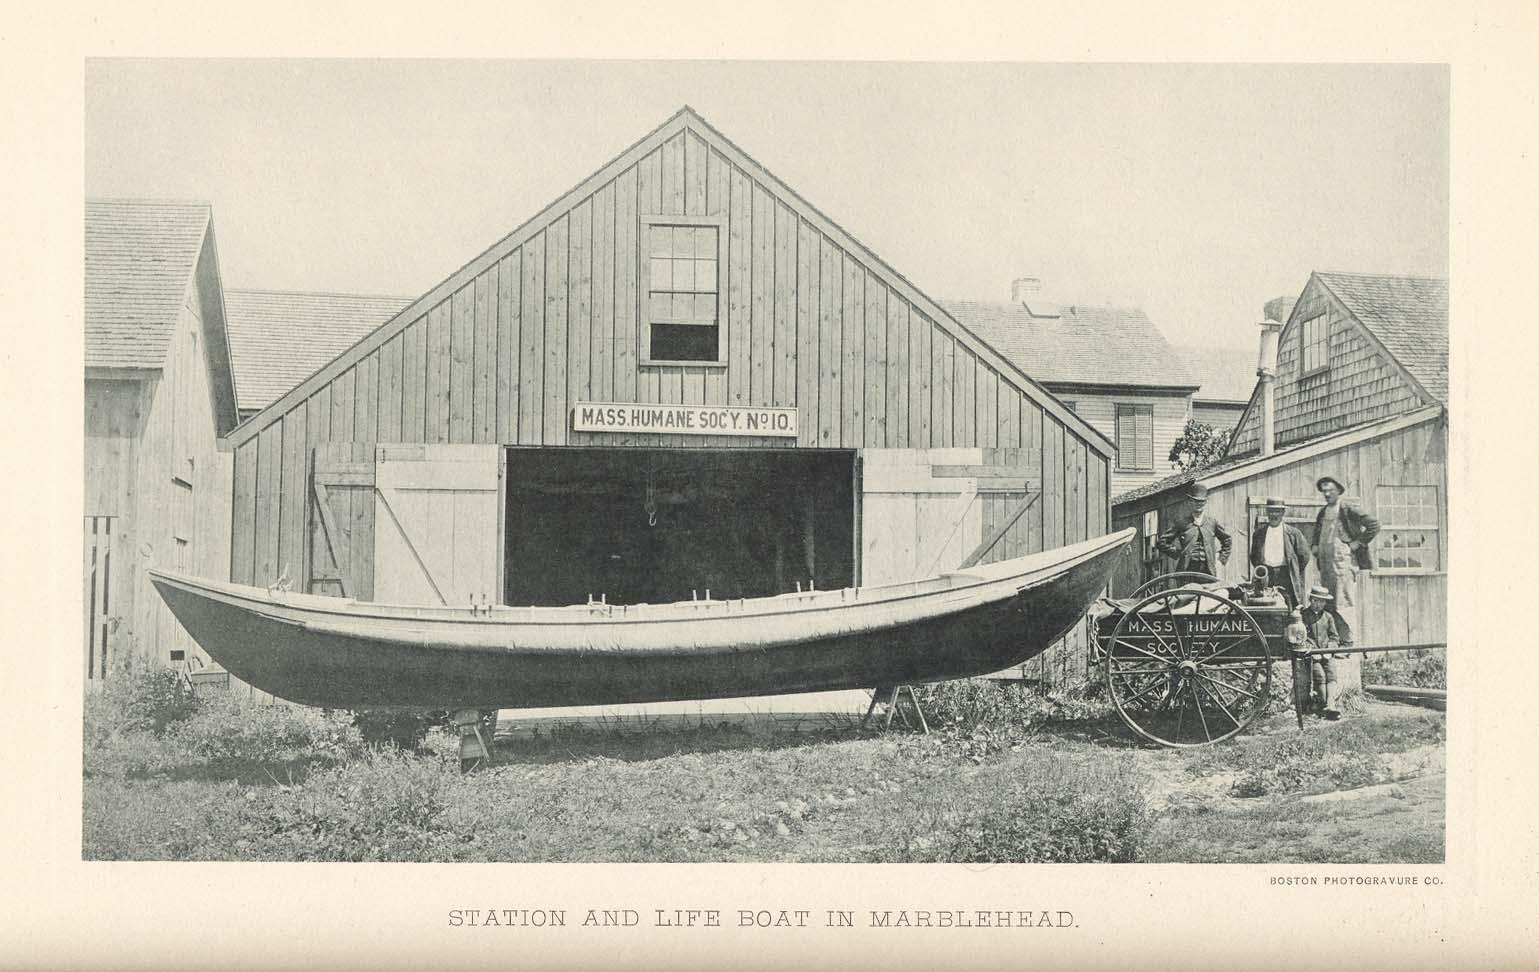 vieux u boat